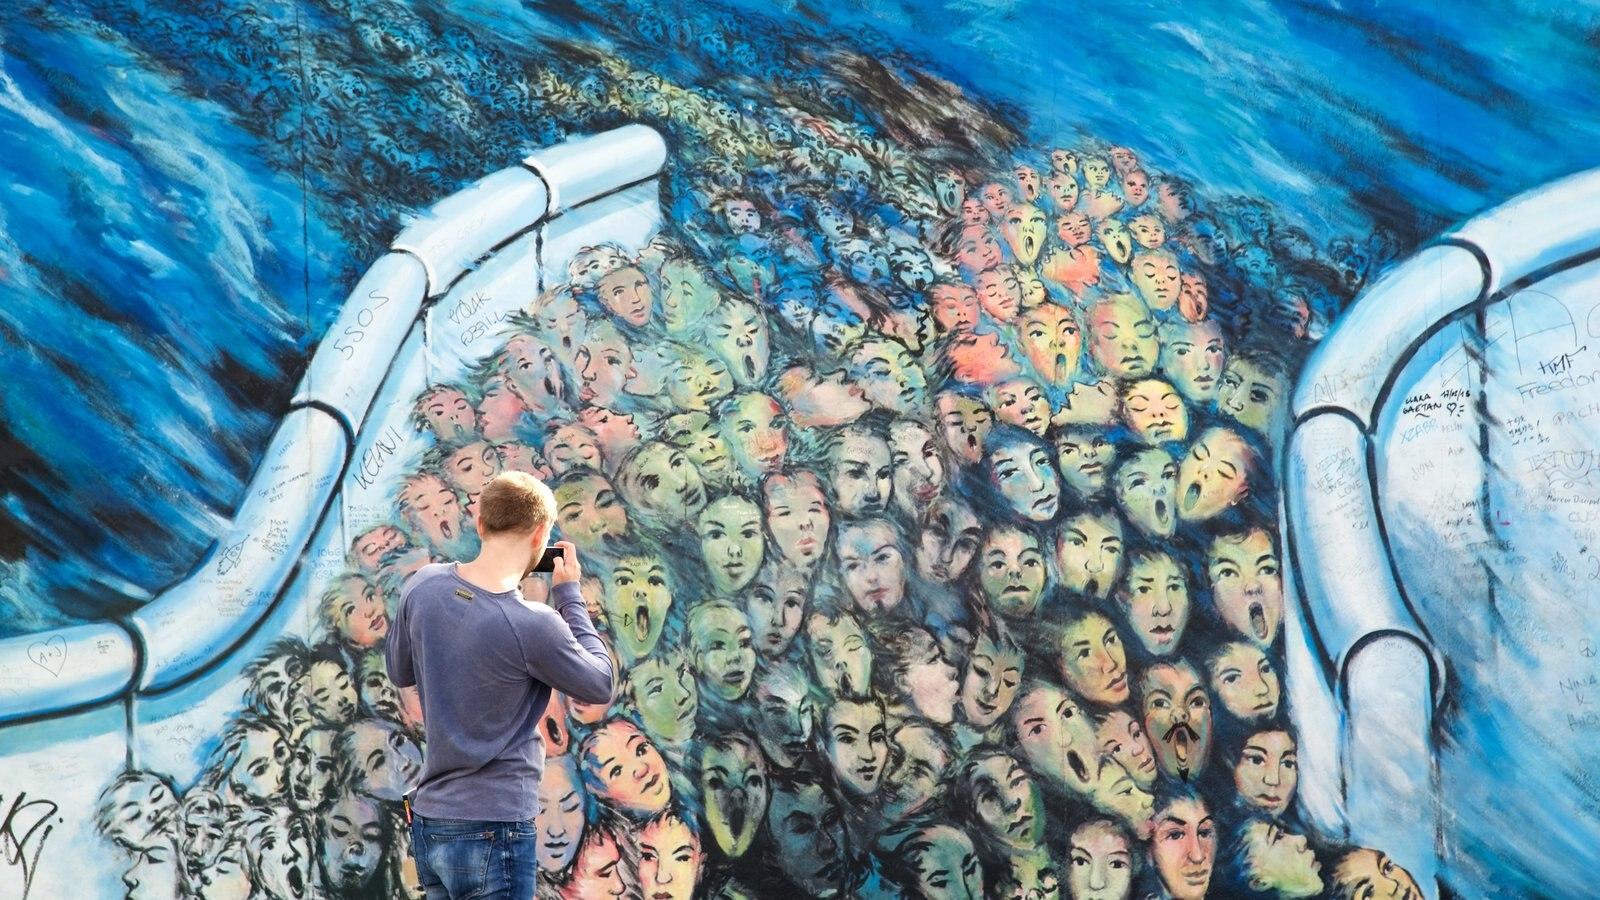 Friedrichshain showing outdoor art as well as an individual male